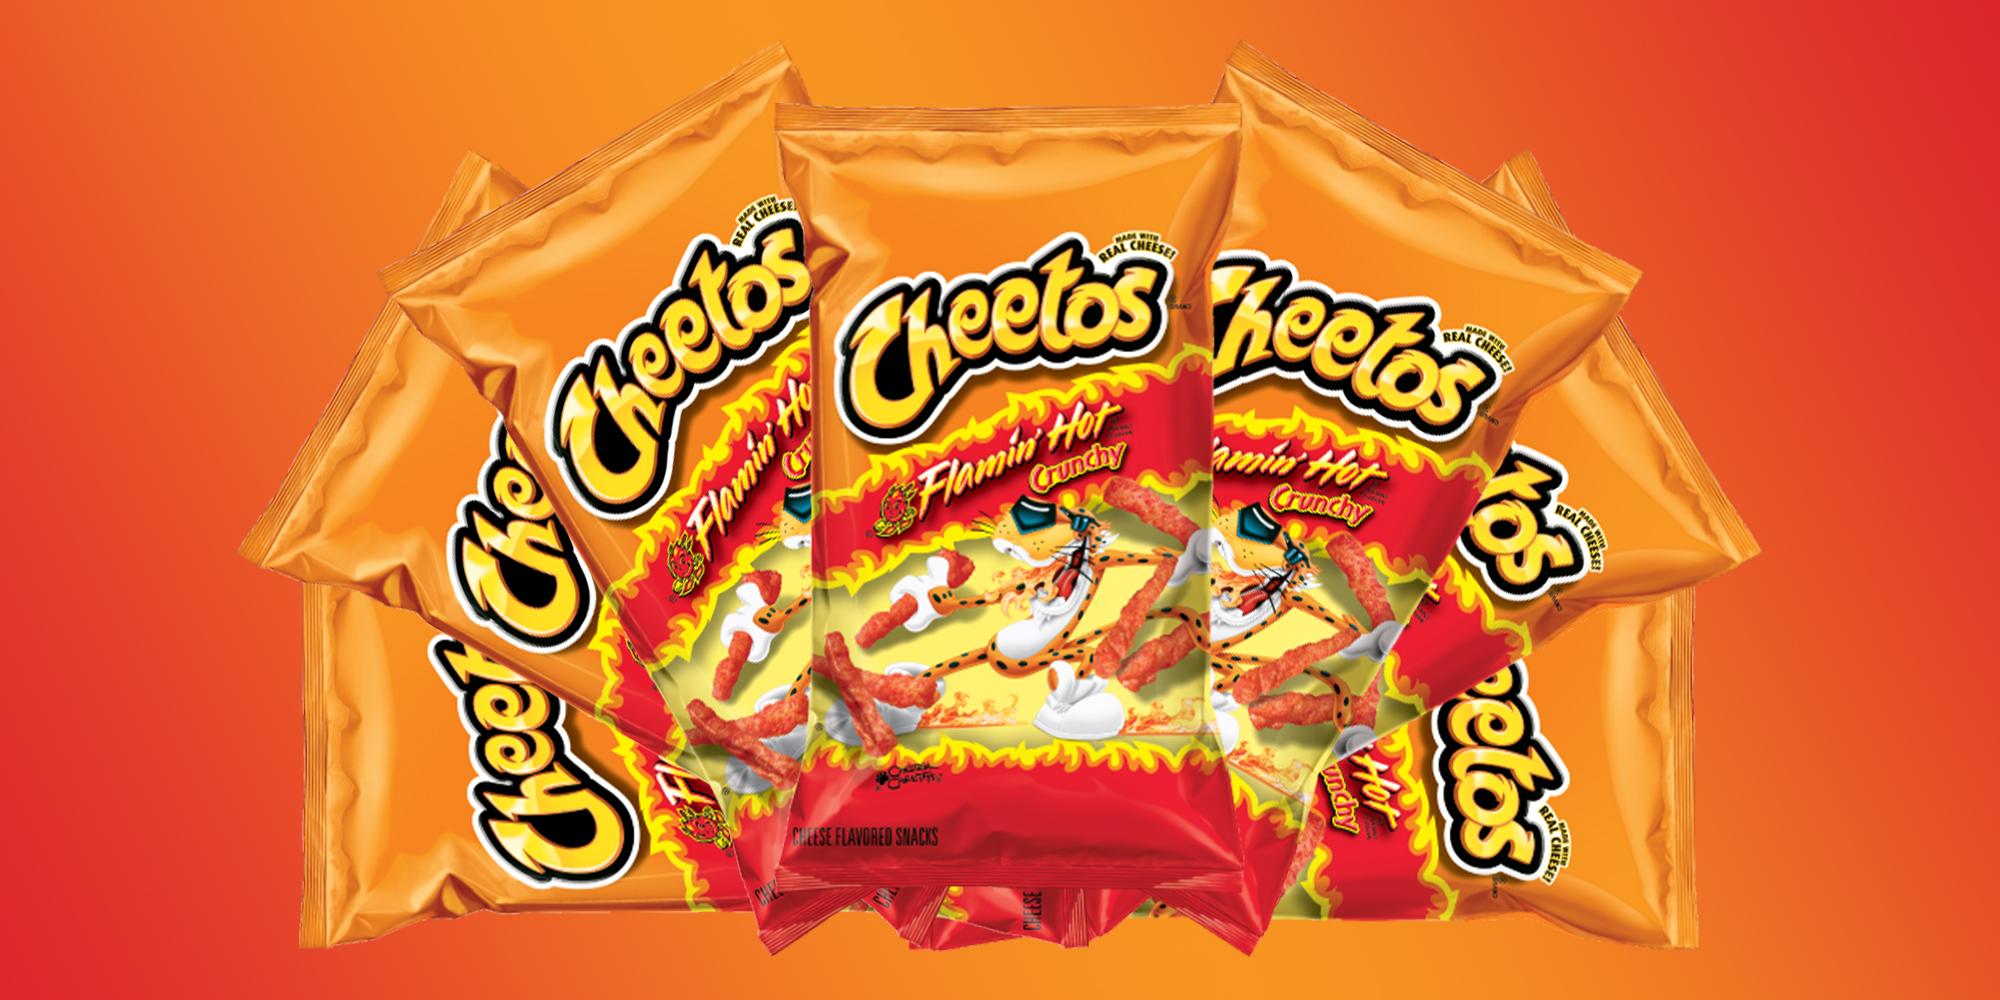 Cosmopolitan Bedroom Blog 15 Flamin Hot Cheetos Struggles That Are So Real